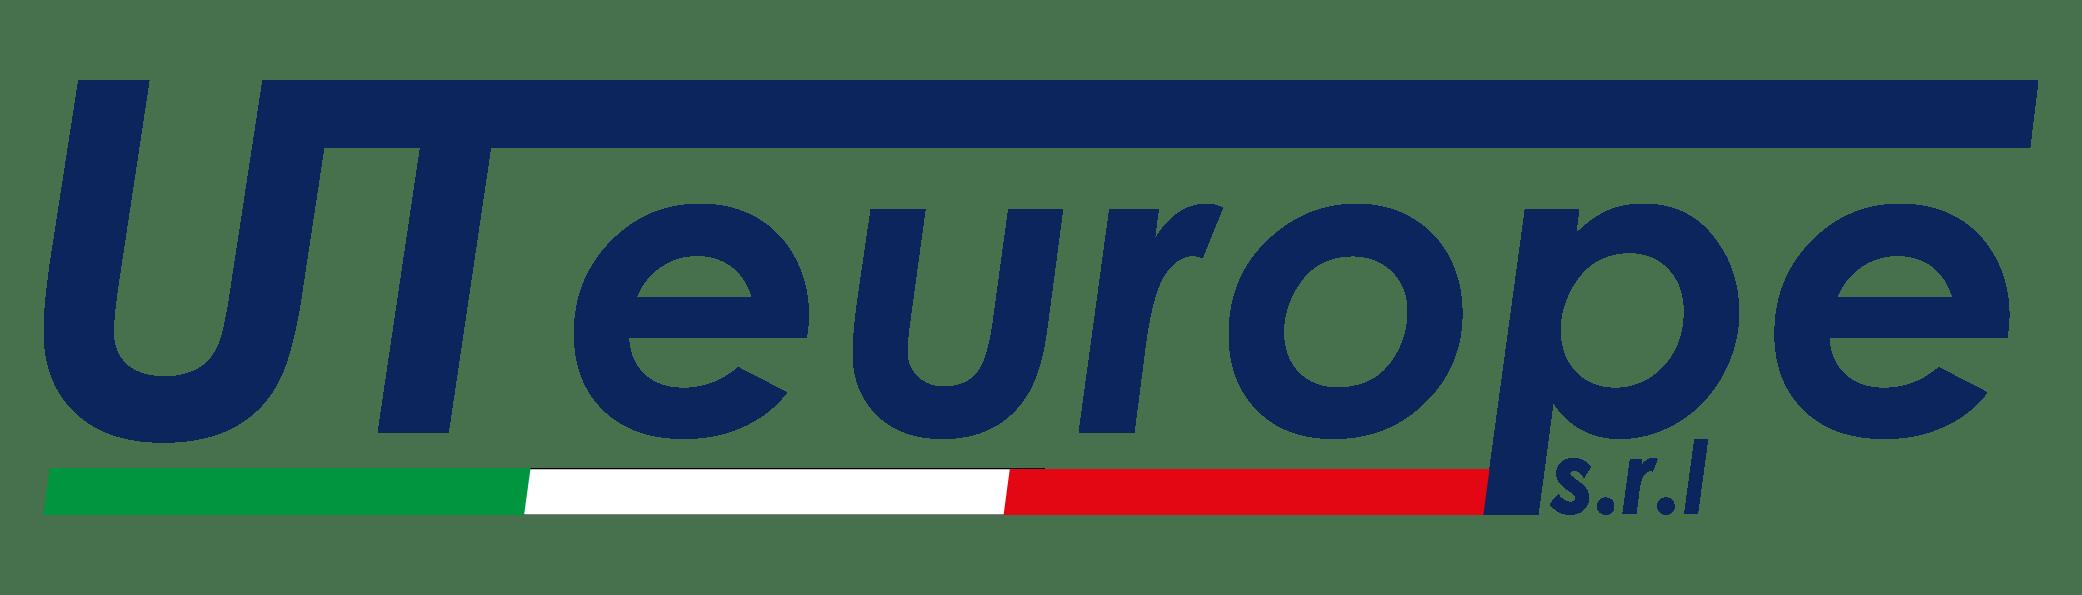 uteurope-logo